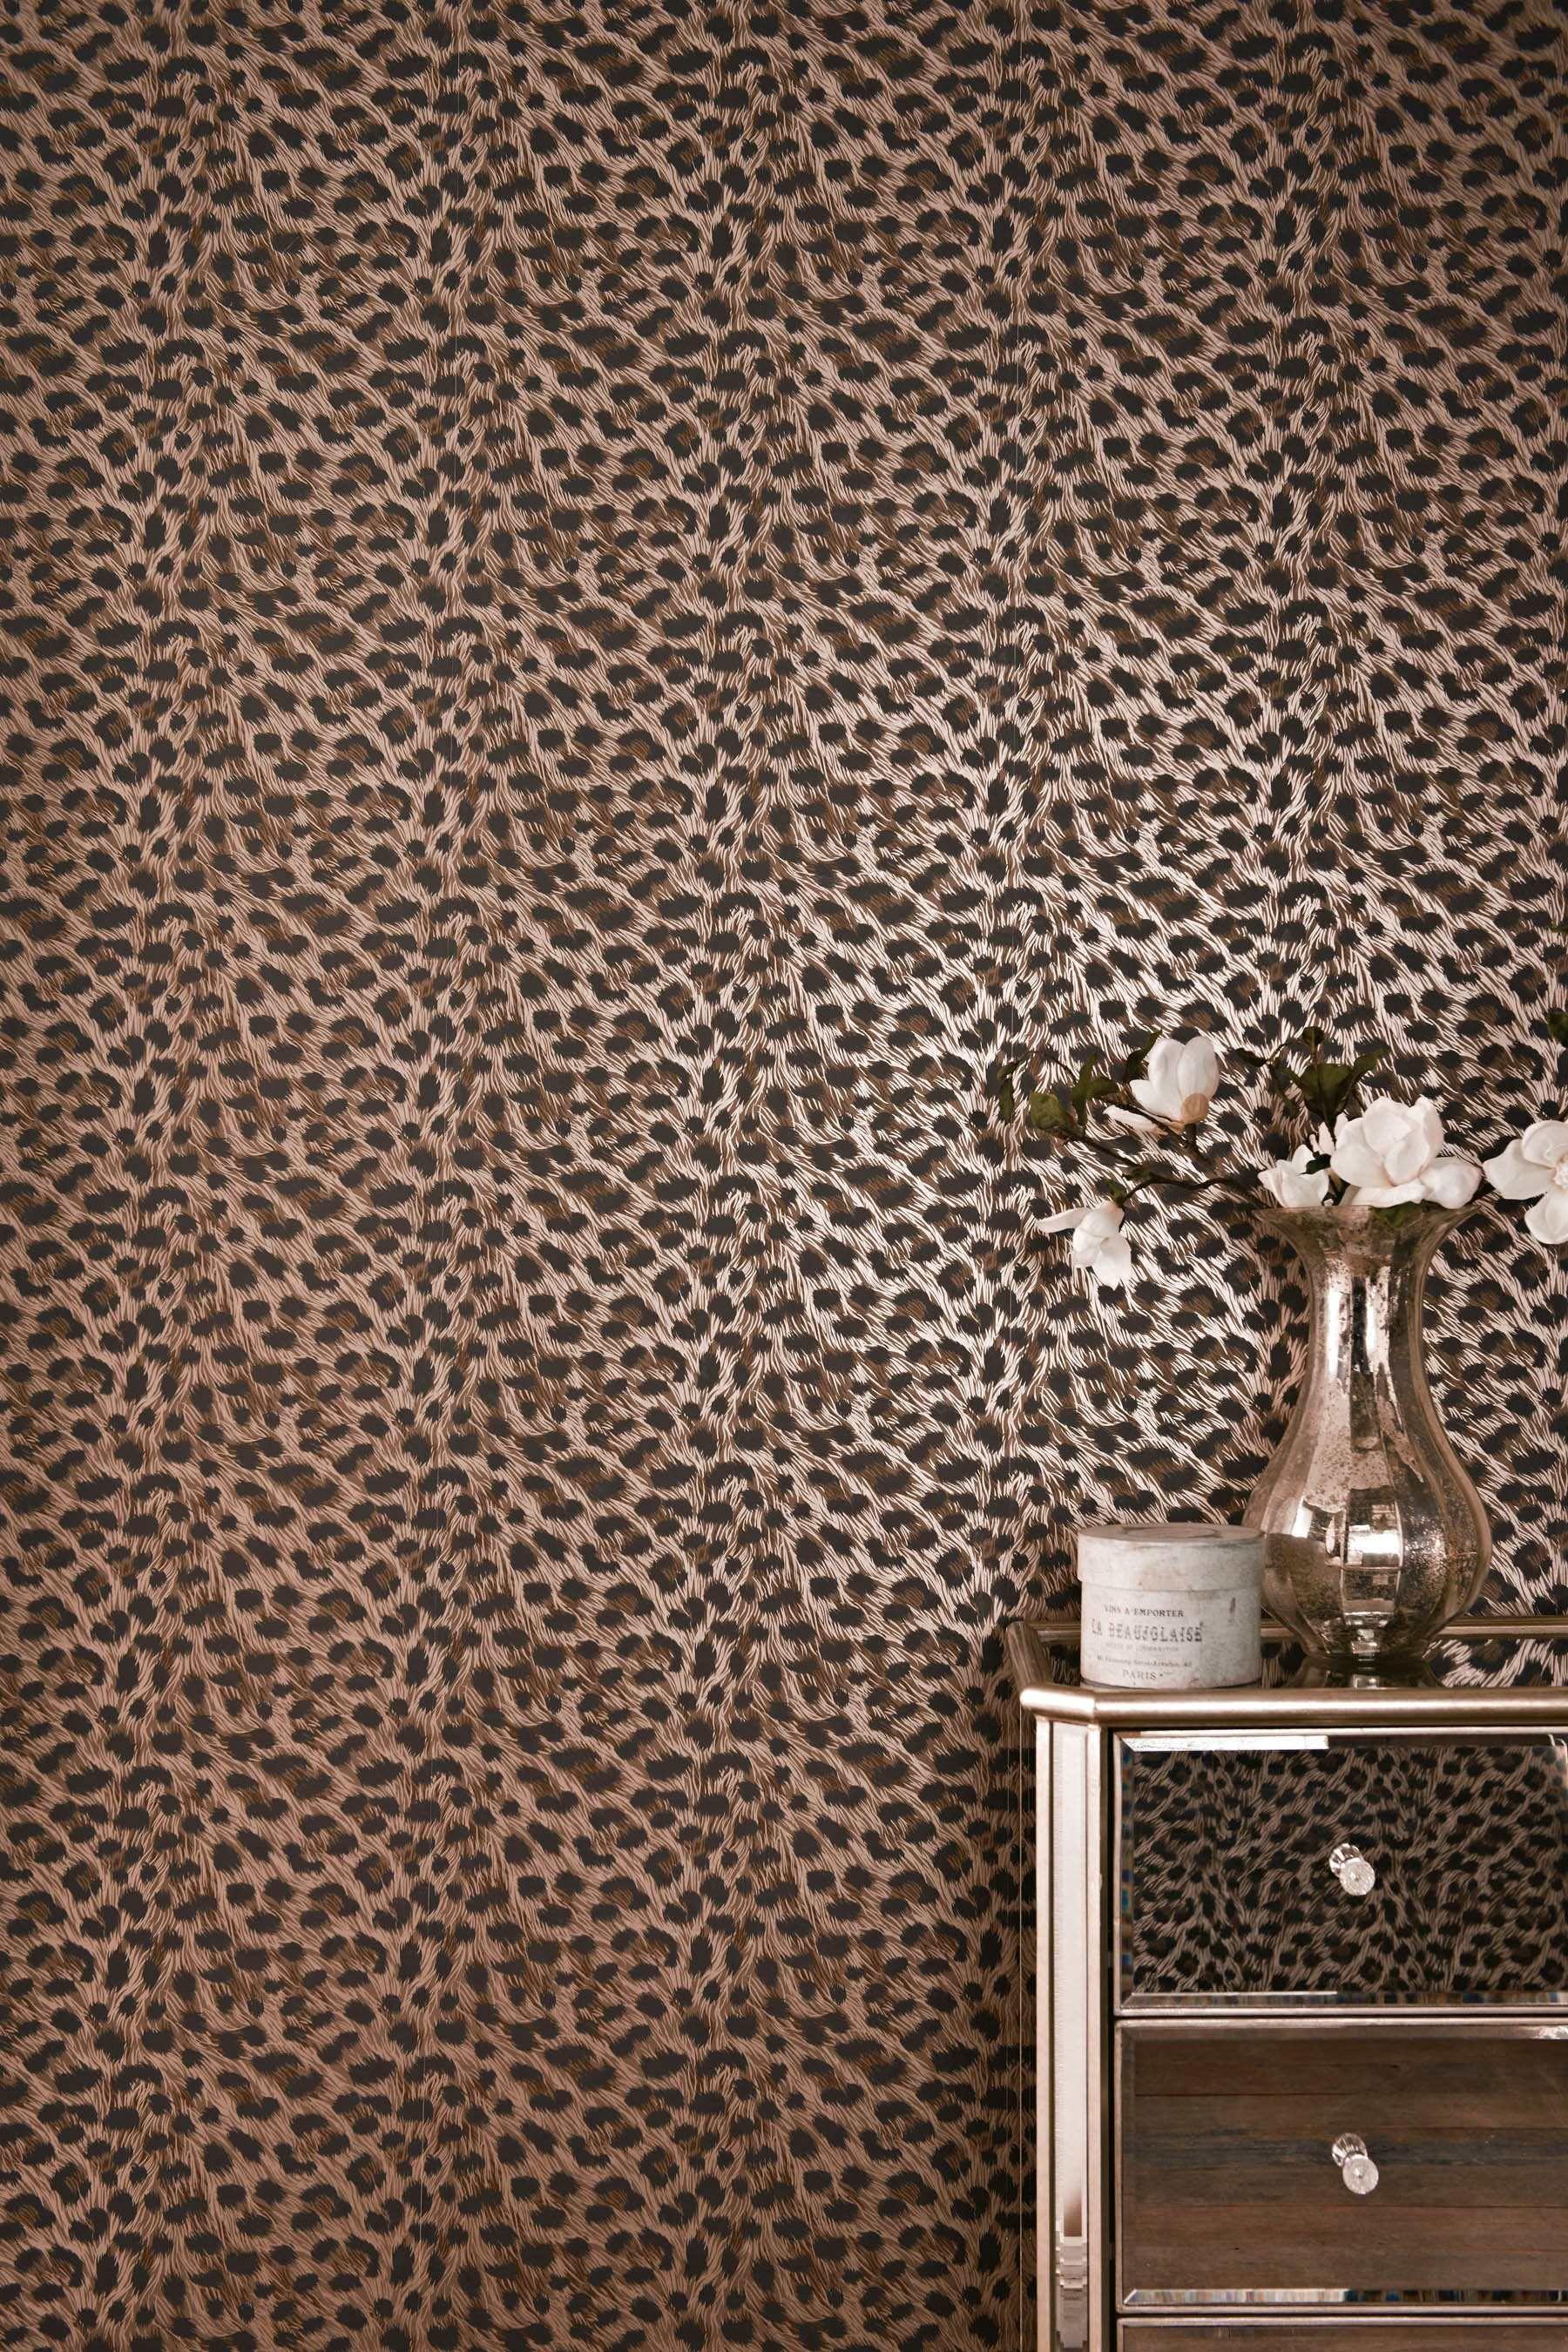 Wallpaper Wednesday Leopard Print Wallpaper from Next   Love Chic 1800x2700